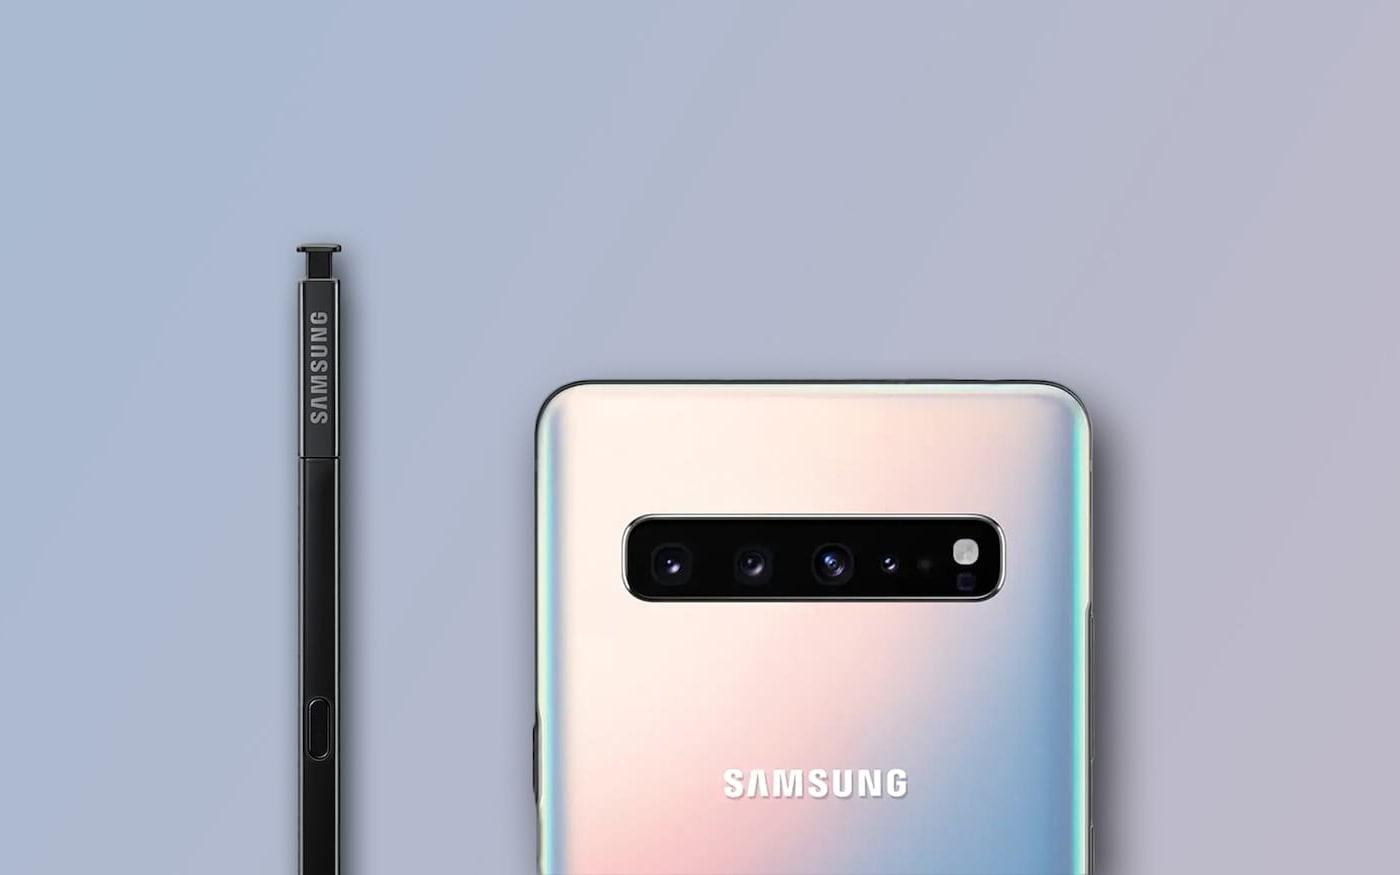 Samsung Galaxy Note 10 deve ter bateria de 4.170 mAh e 1 TB de armazenamento interno